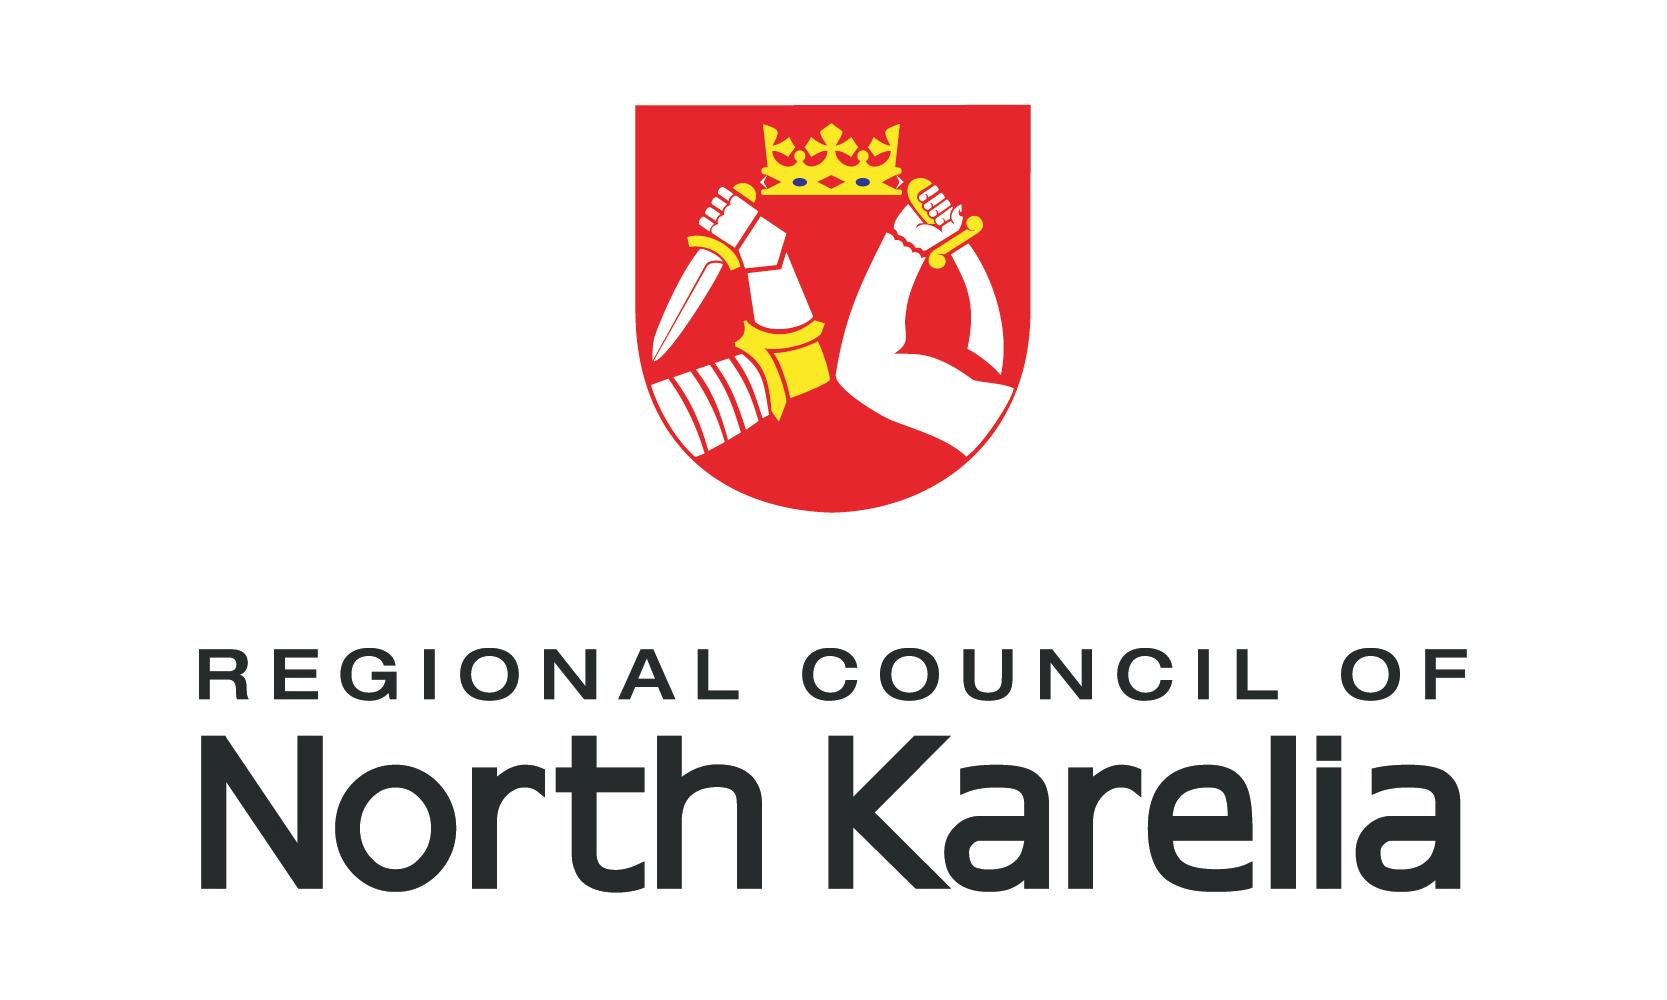 Regional Council of North Karelia